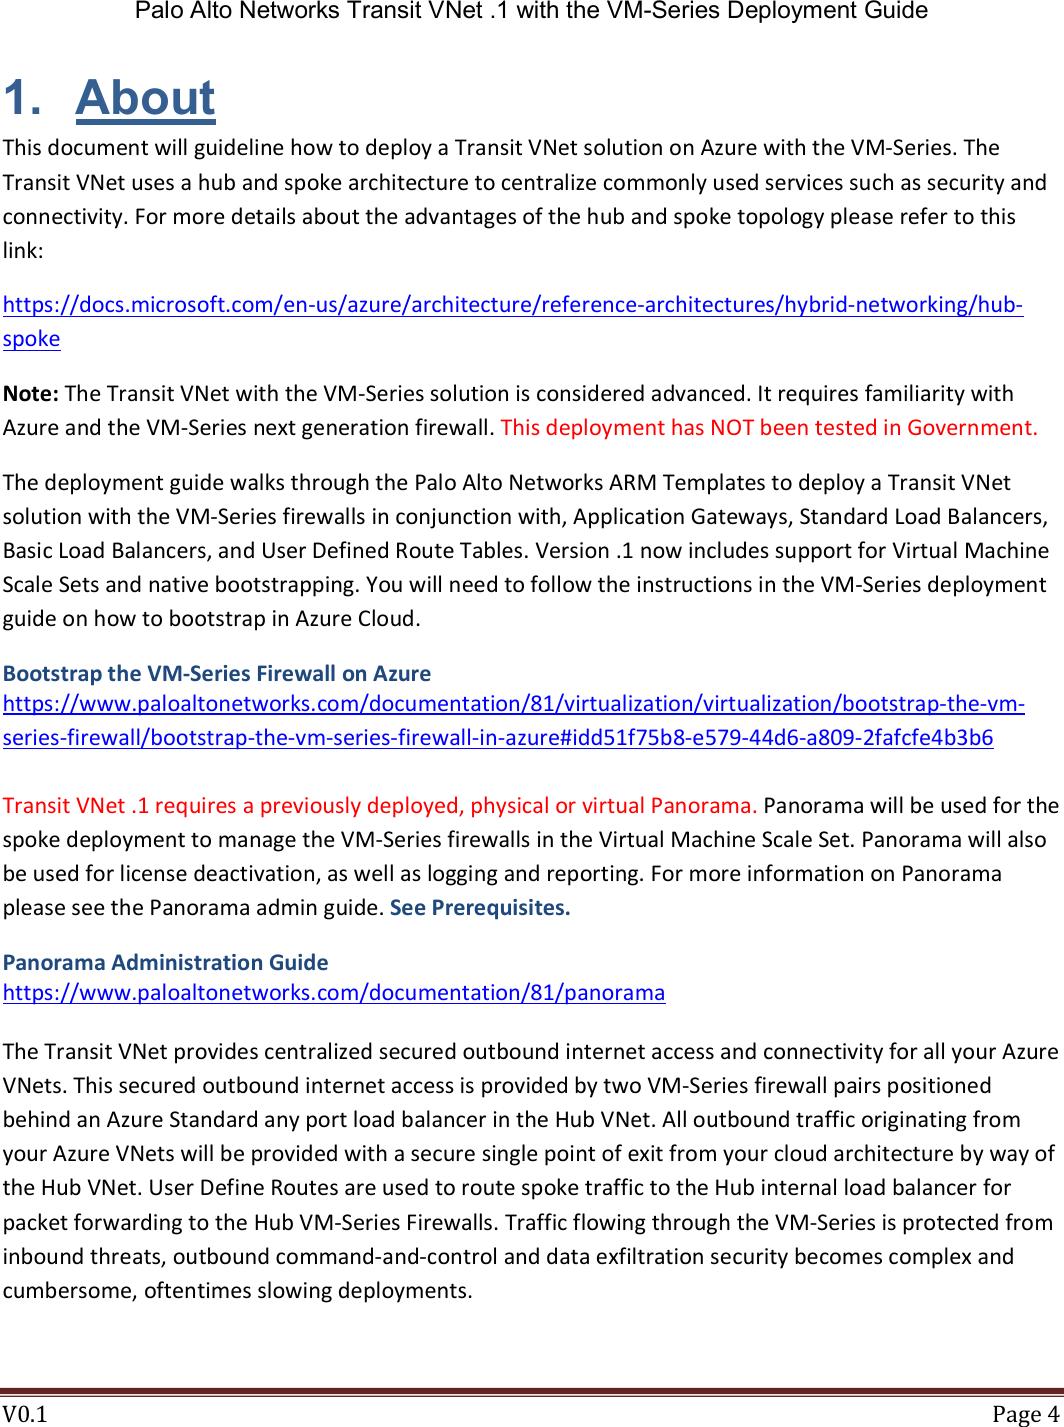 Azure_Transit_vNet 1_Deployment_GuideRev1 2x Azure Transit